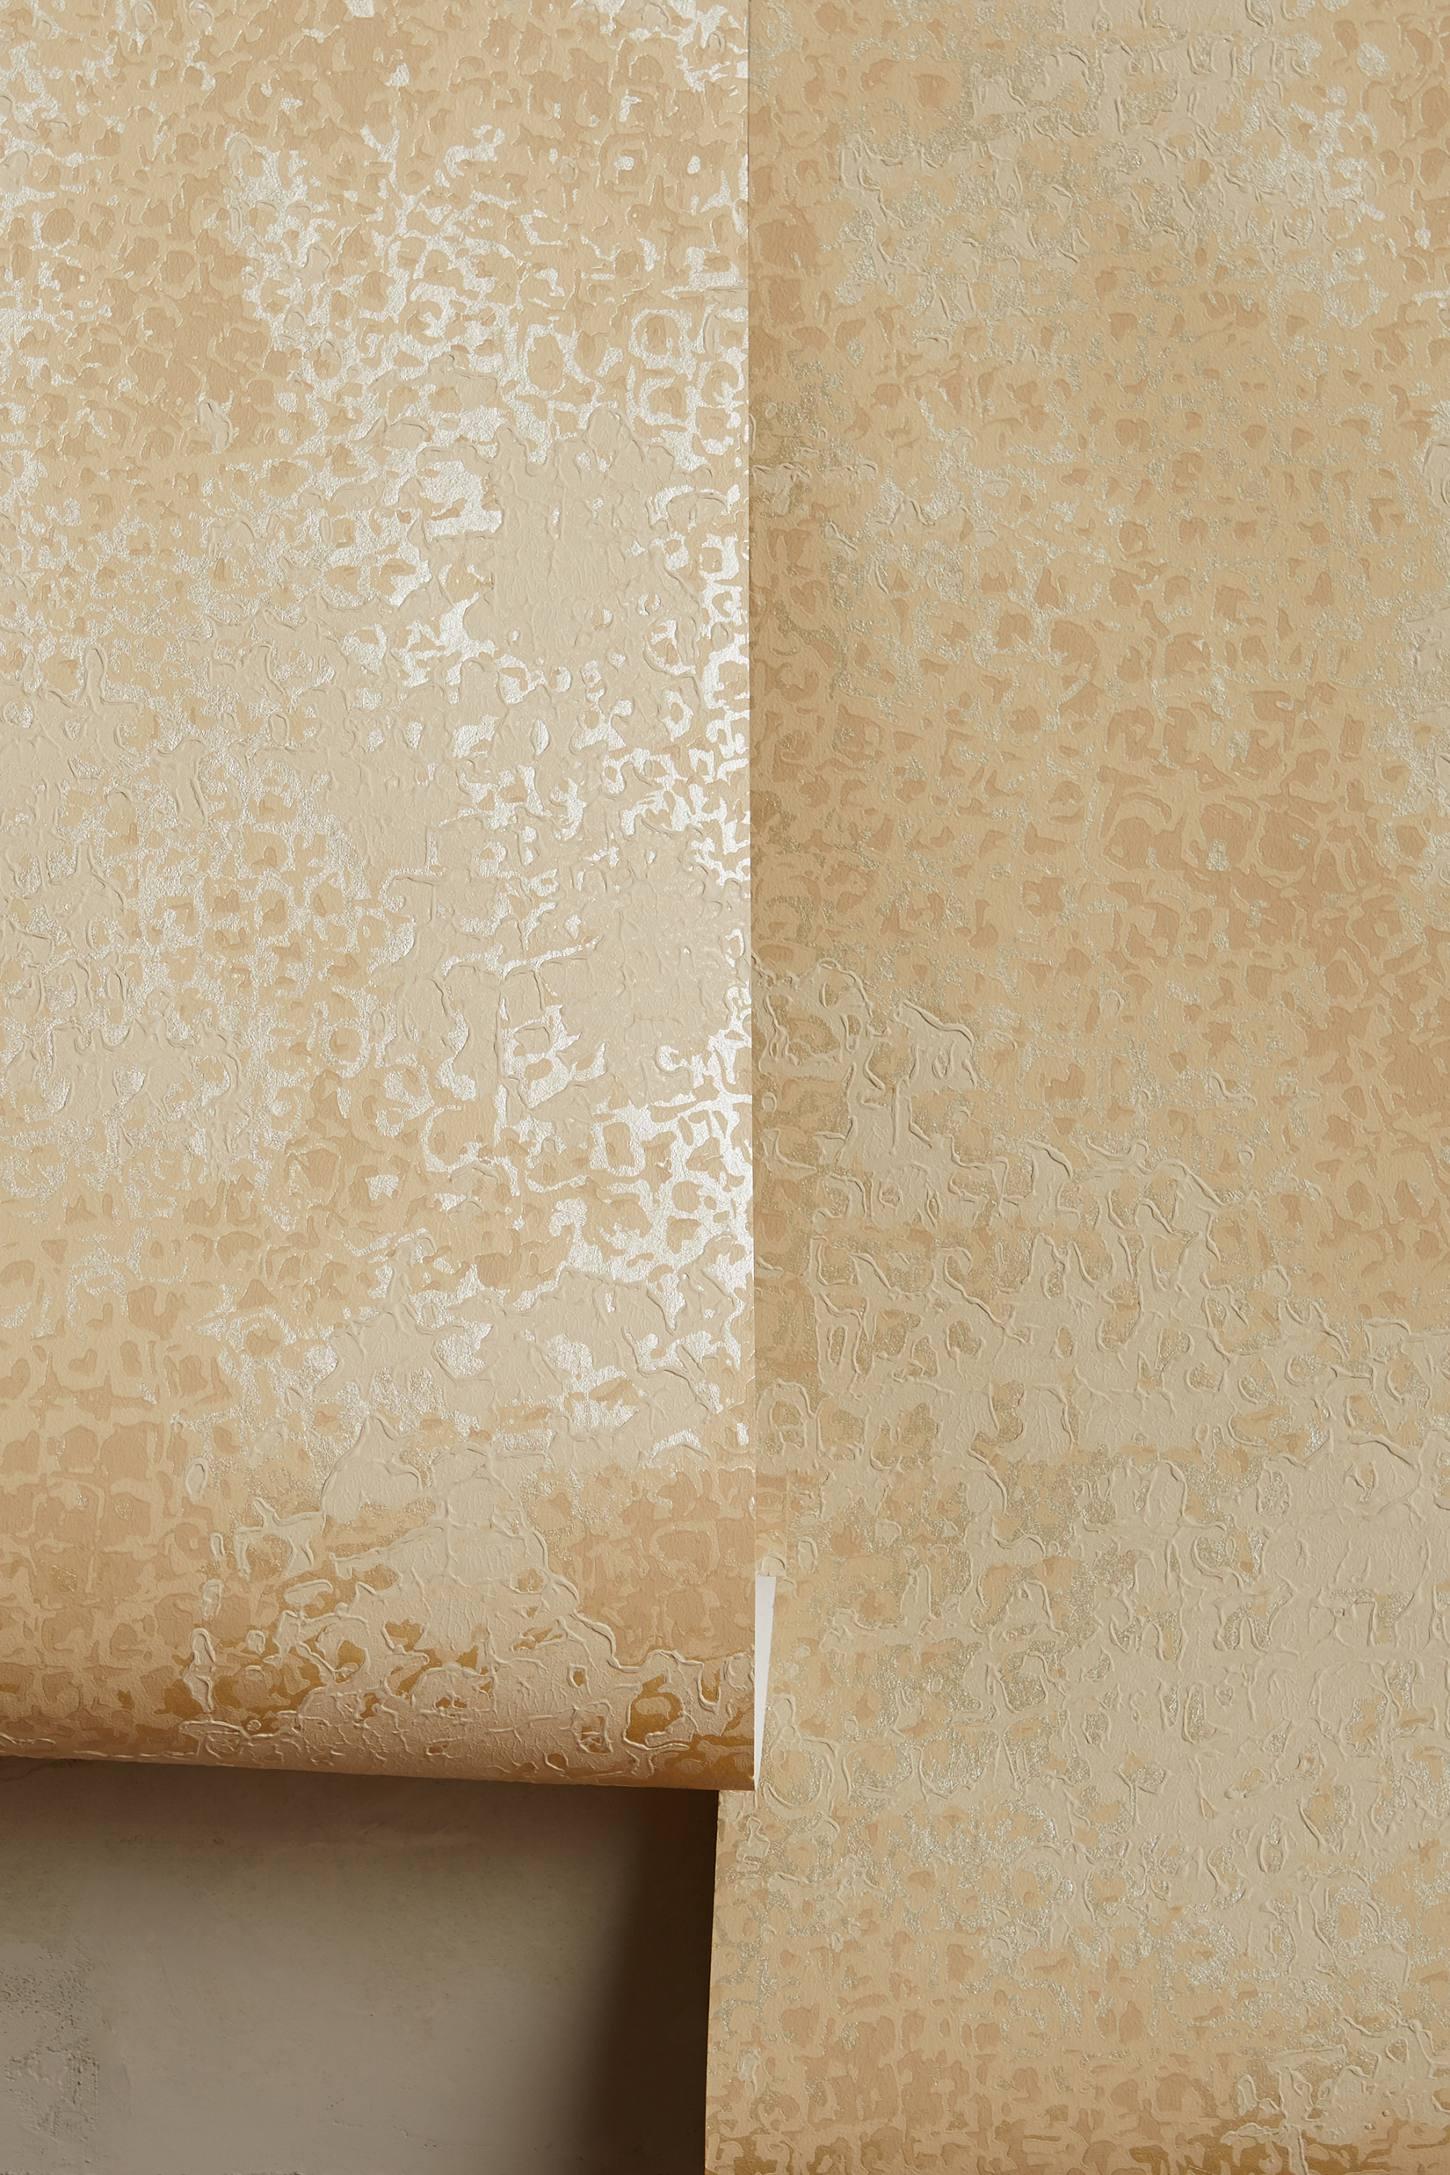 Textured Foil Wallpaper | Anthropologie